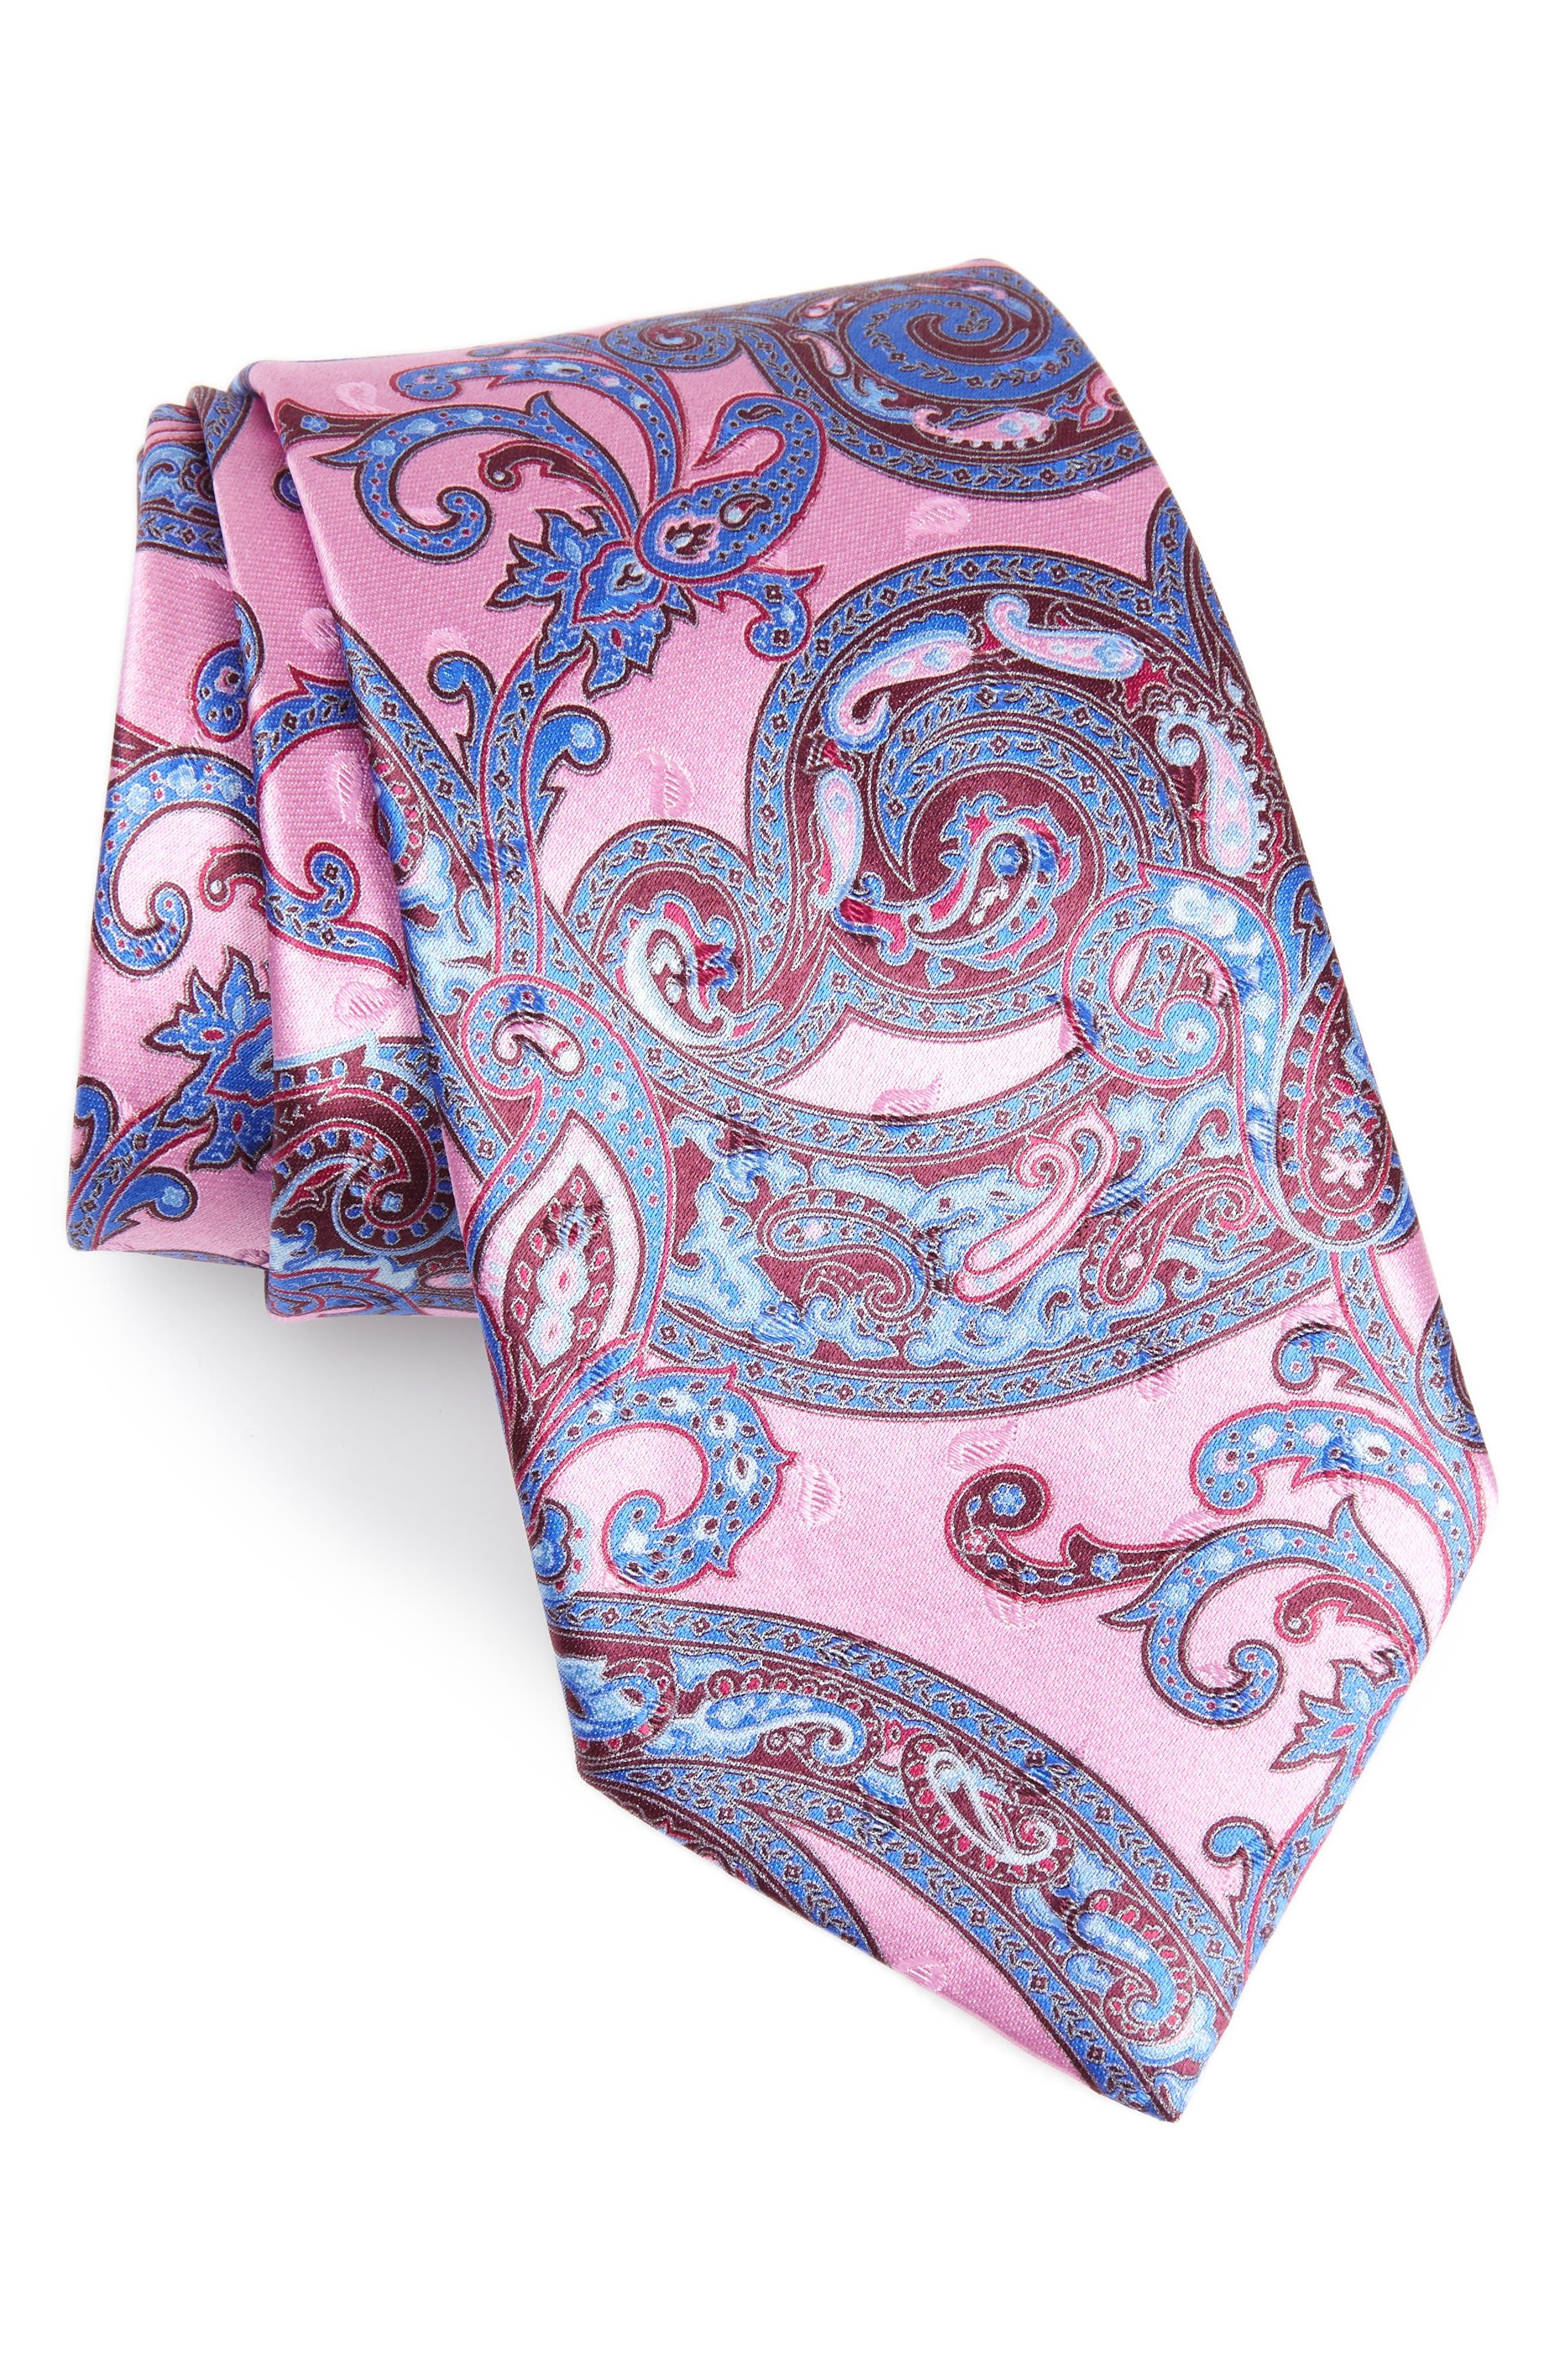 ERMENEGILDO ZEGNA, Paisley Silk Tie, Main thumbnail 1, color, PINK